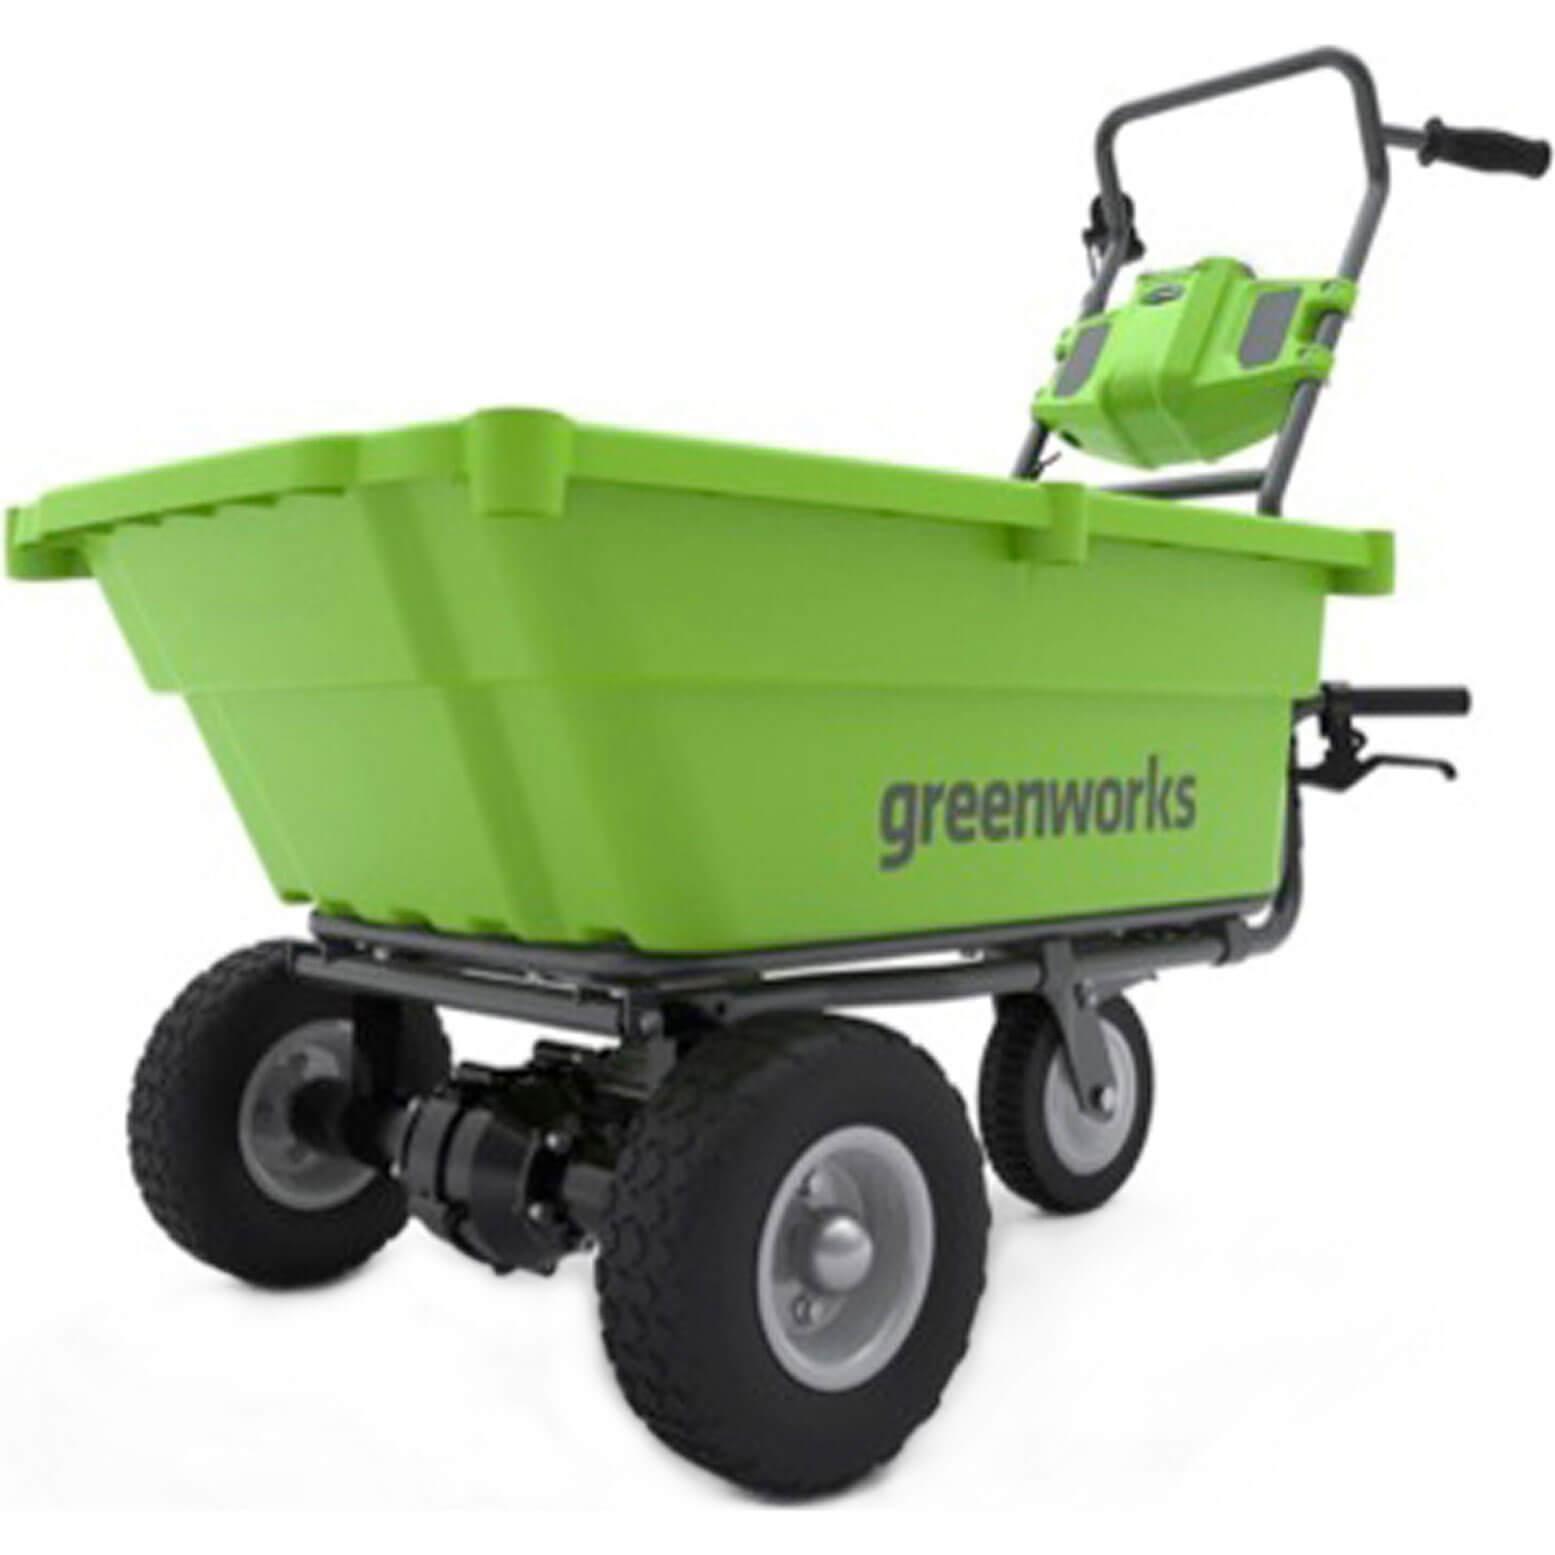 Image of Greenworks G40GC 40v Cordless Garden Cart No Batteries No Charger